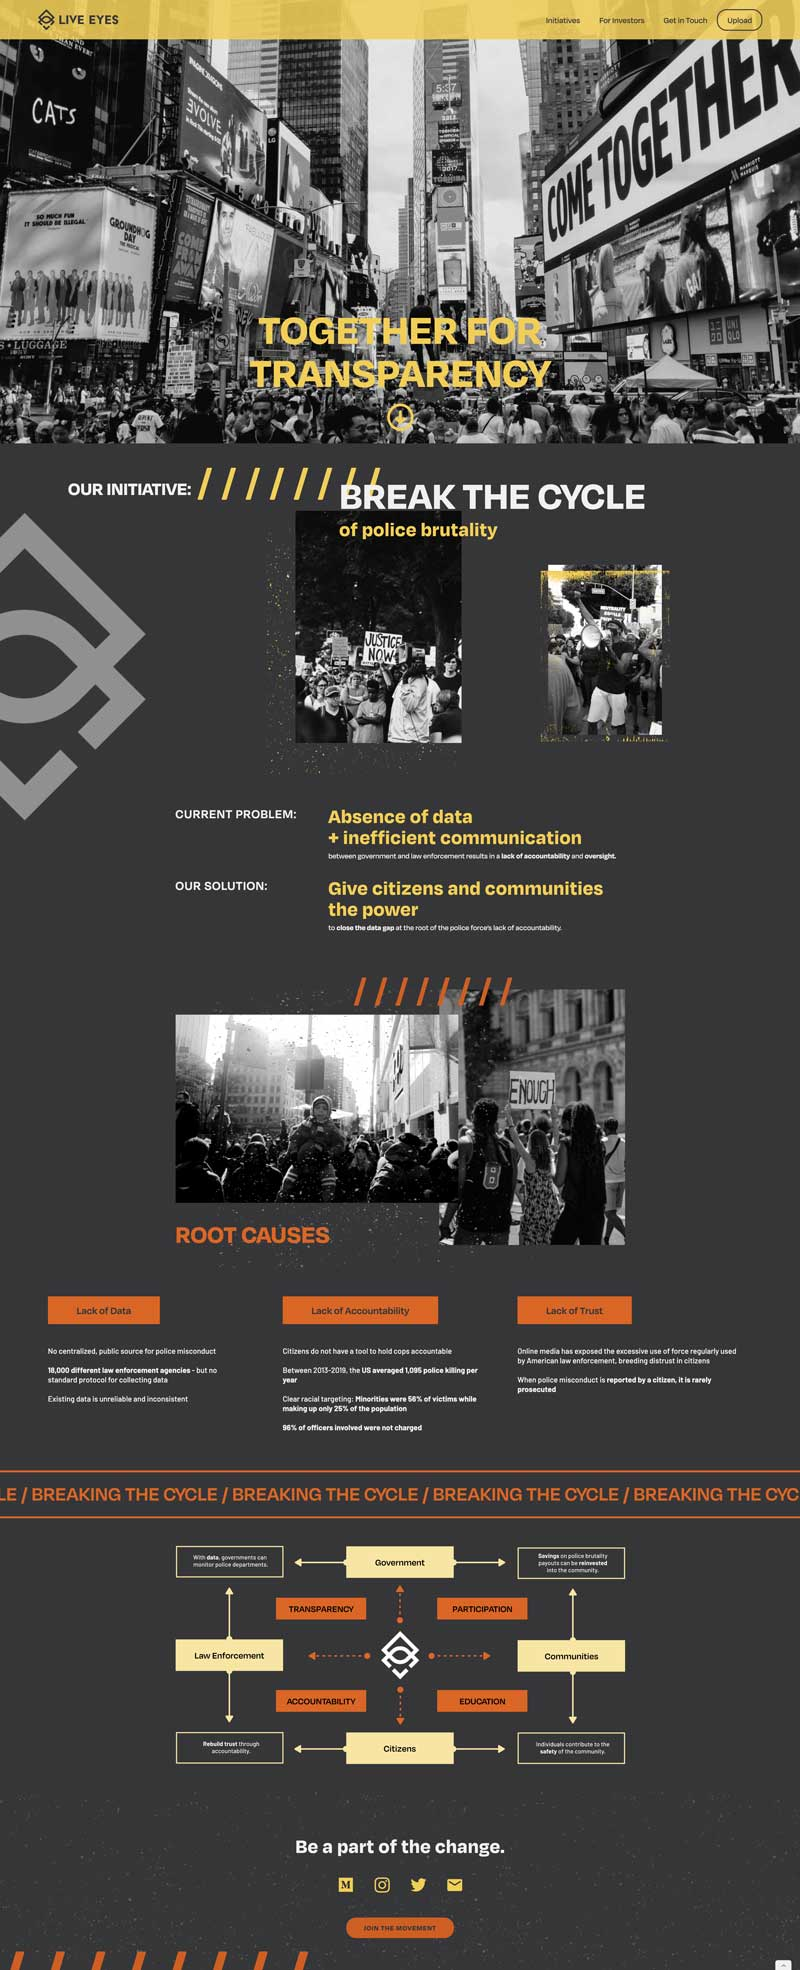 screencapture-liveeyes-app-initiatives-2021-03-25-18_43_00